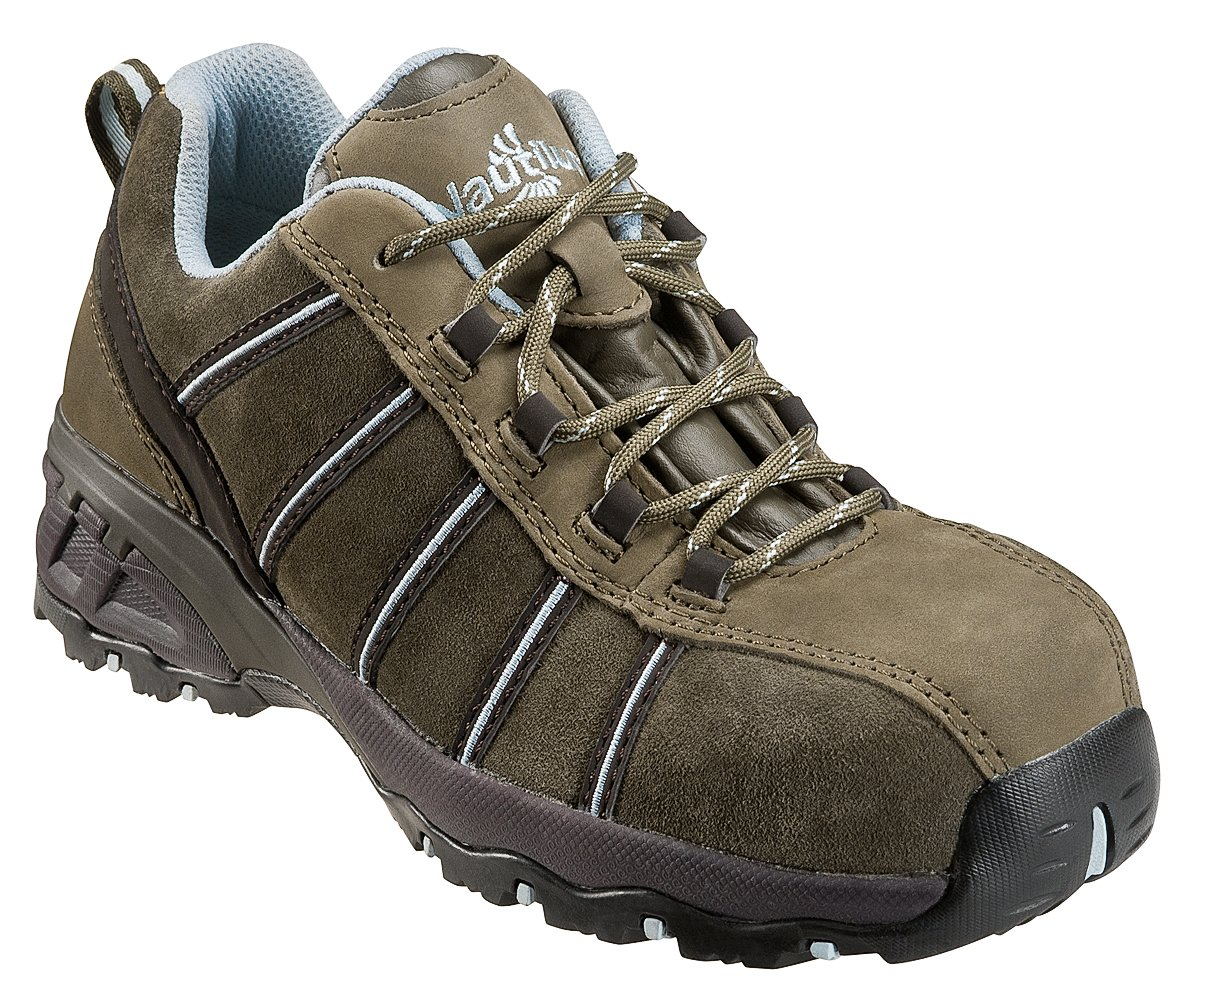 Nautilus Safety Footwear Women's N1758 Composite Toe Sneaker,Olive,9 W US